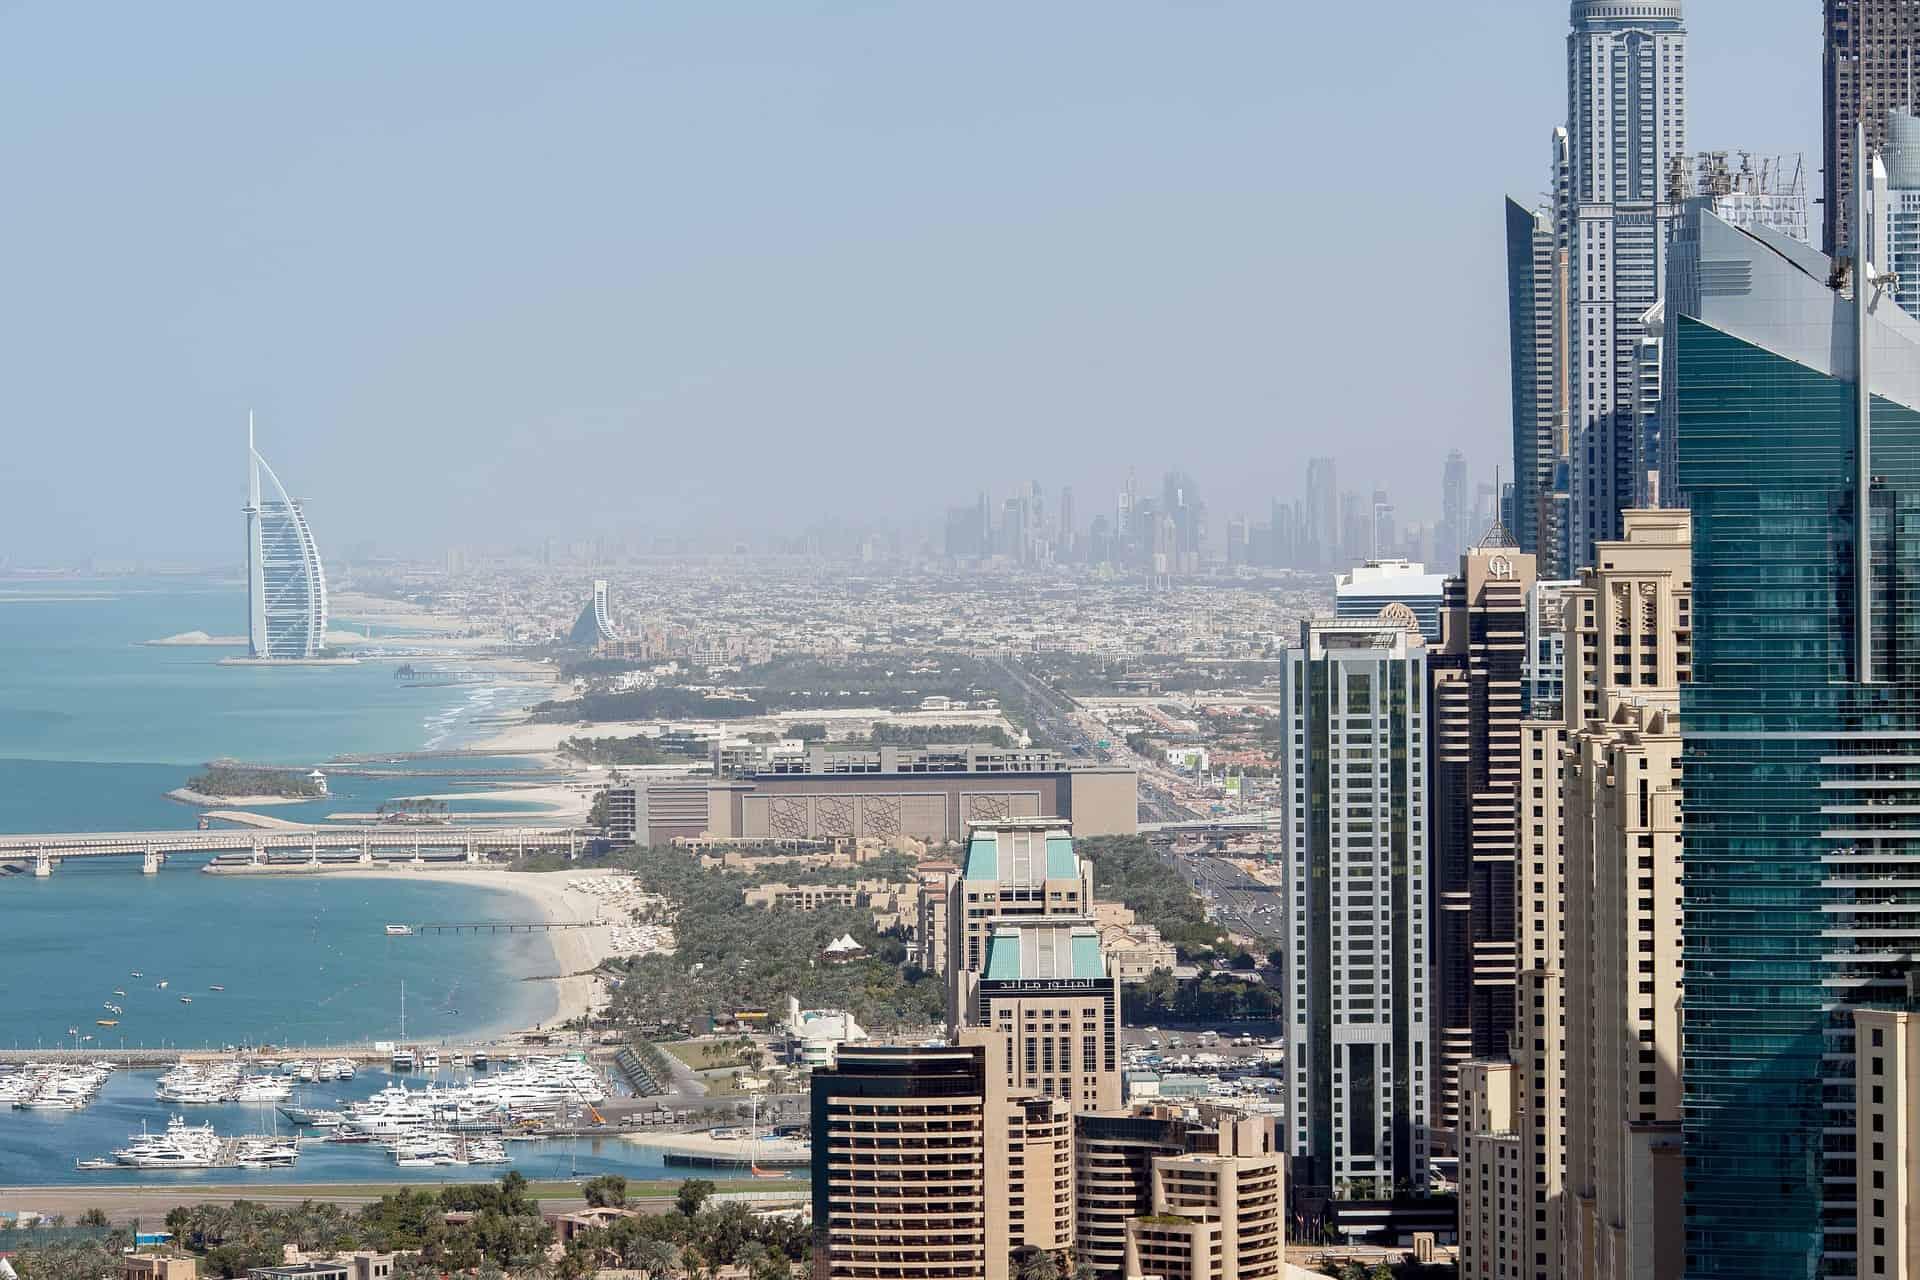 Cosmopolitan Dubai 5 Tage - 4 Sterne nur 269,00€ Pauschal